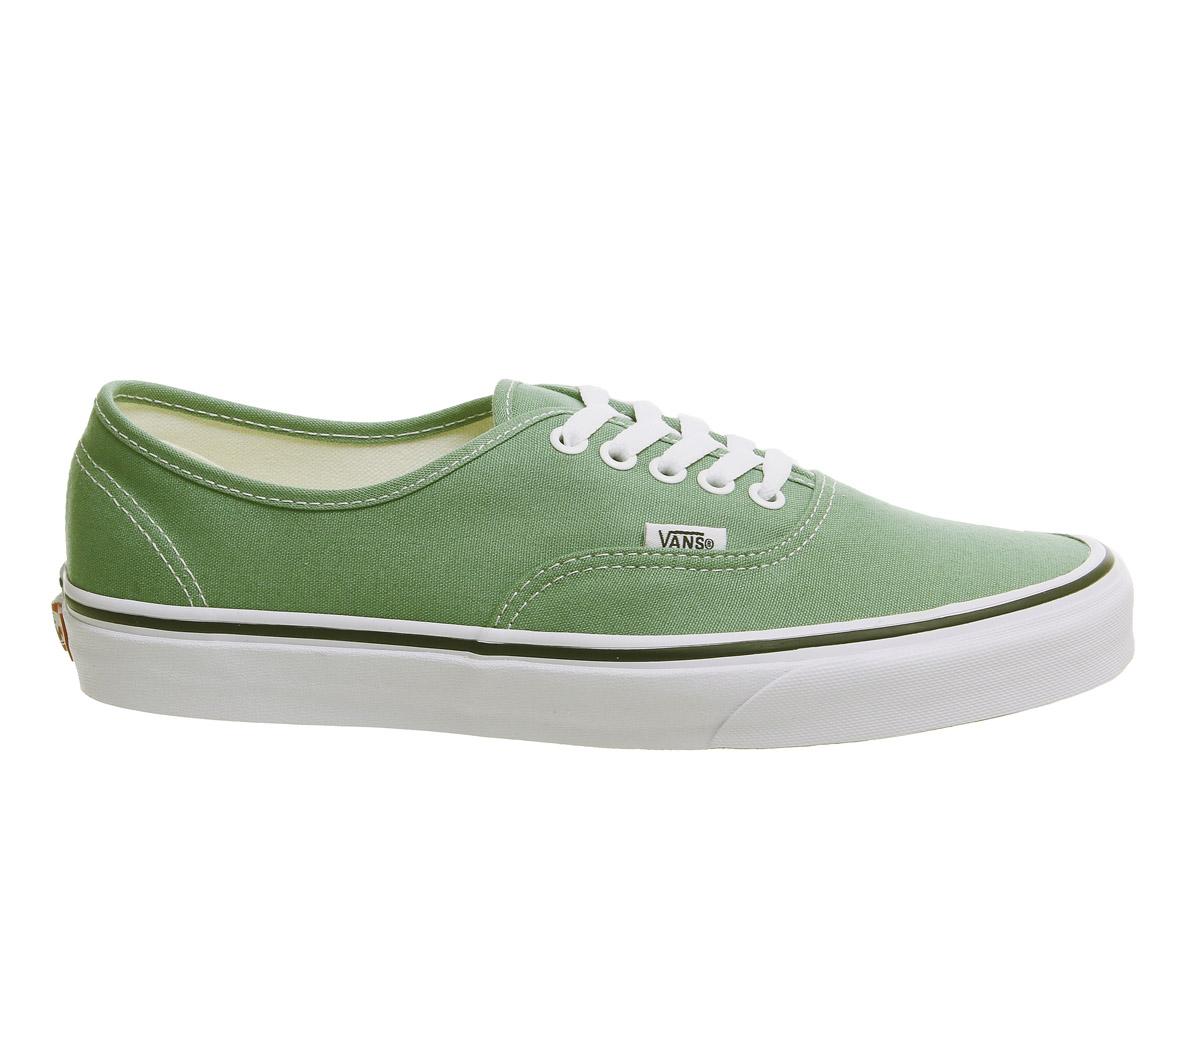 d76b6a50b9ca5 SENTINEL Mens Vans autentici formatori verde intenso di erba vera  allenatori bianco scarpe